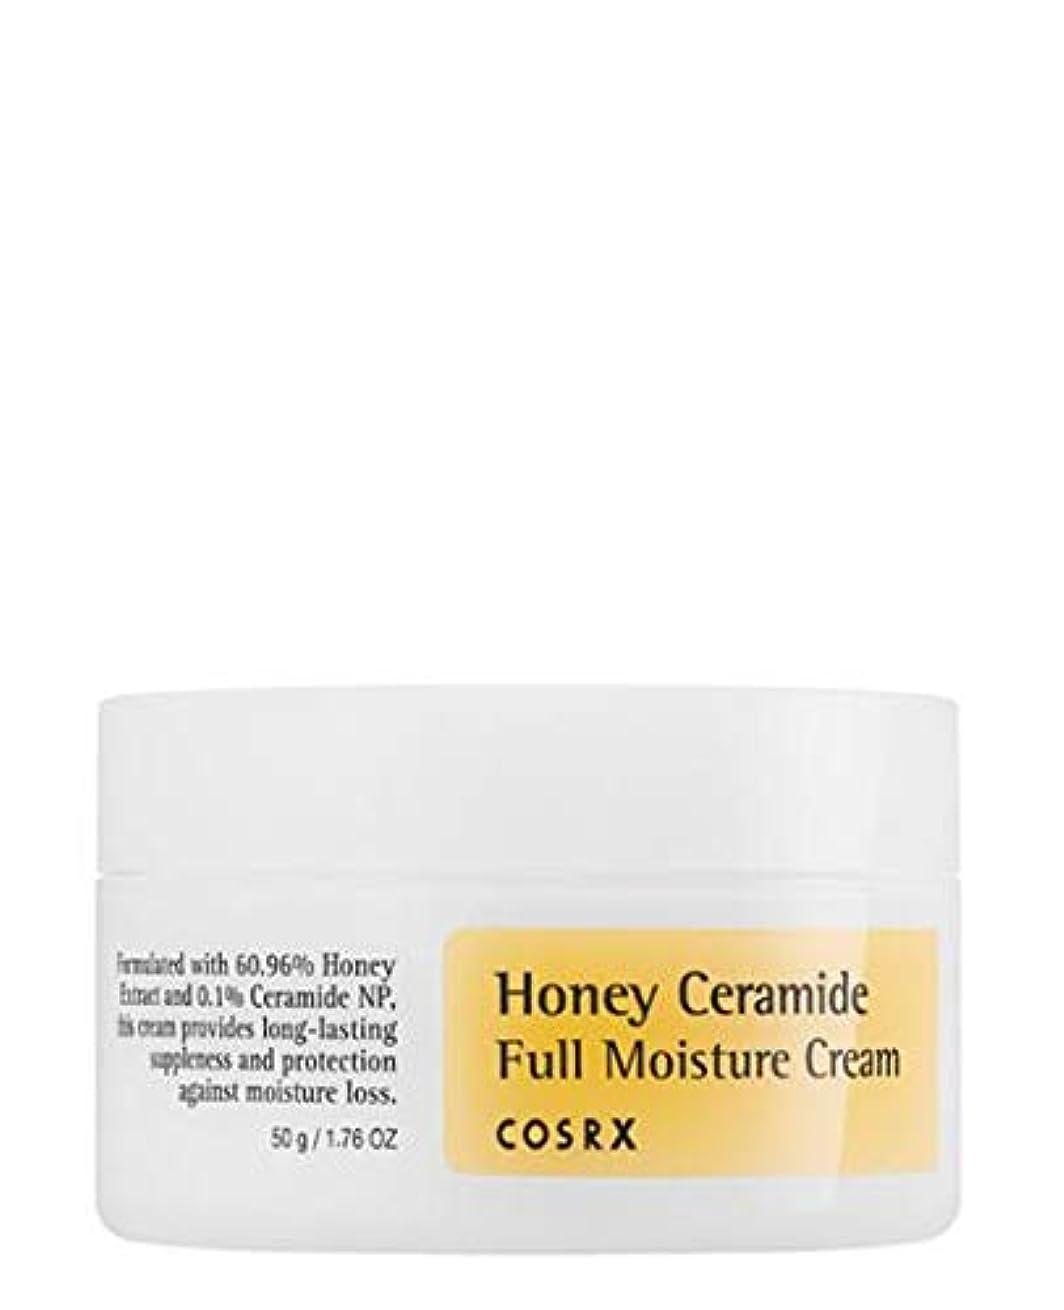 COSRX Honey Ceramide Full Moisture Cream (並行輸入品)